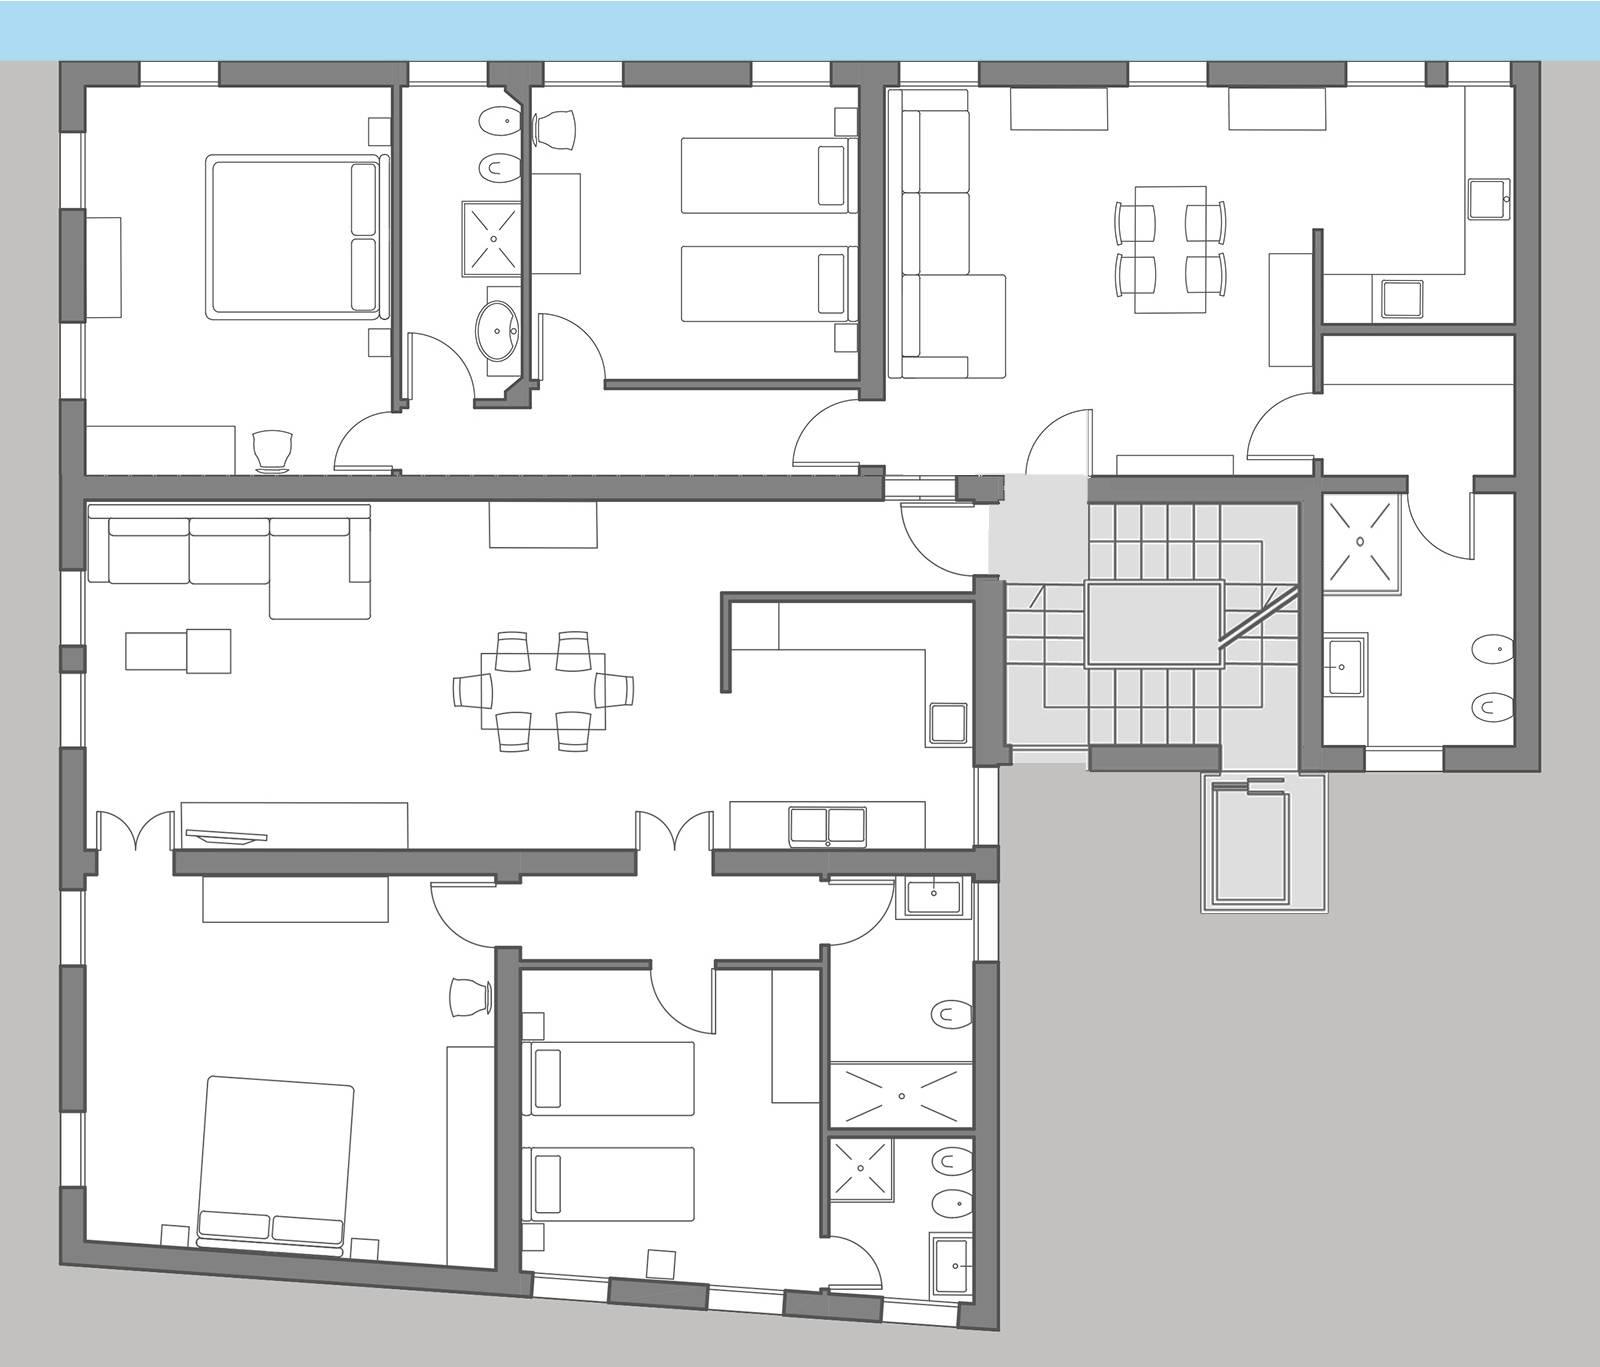 Rigoletto floor plan